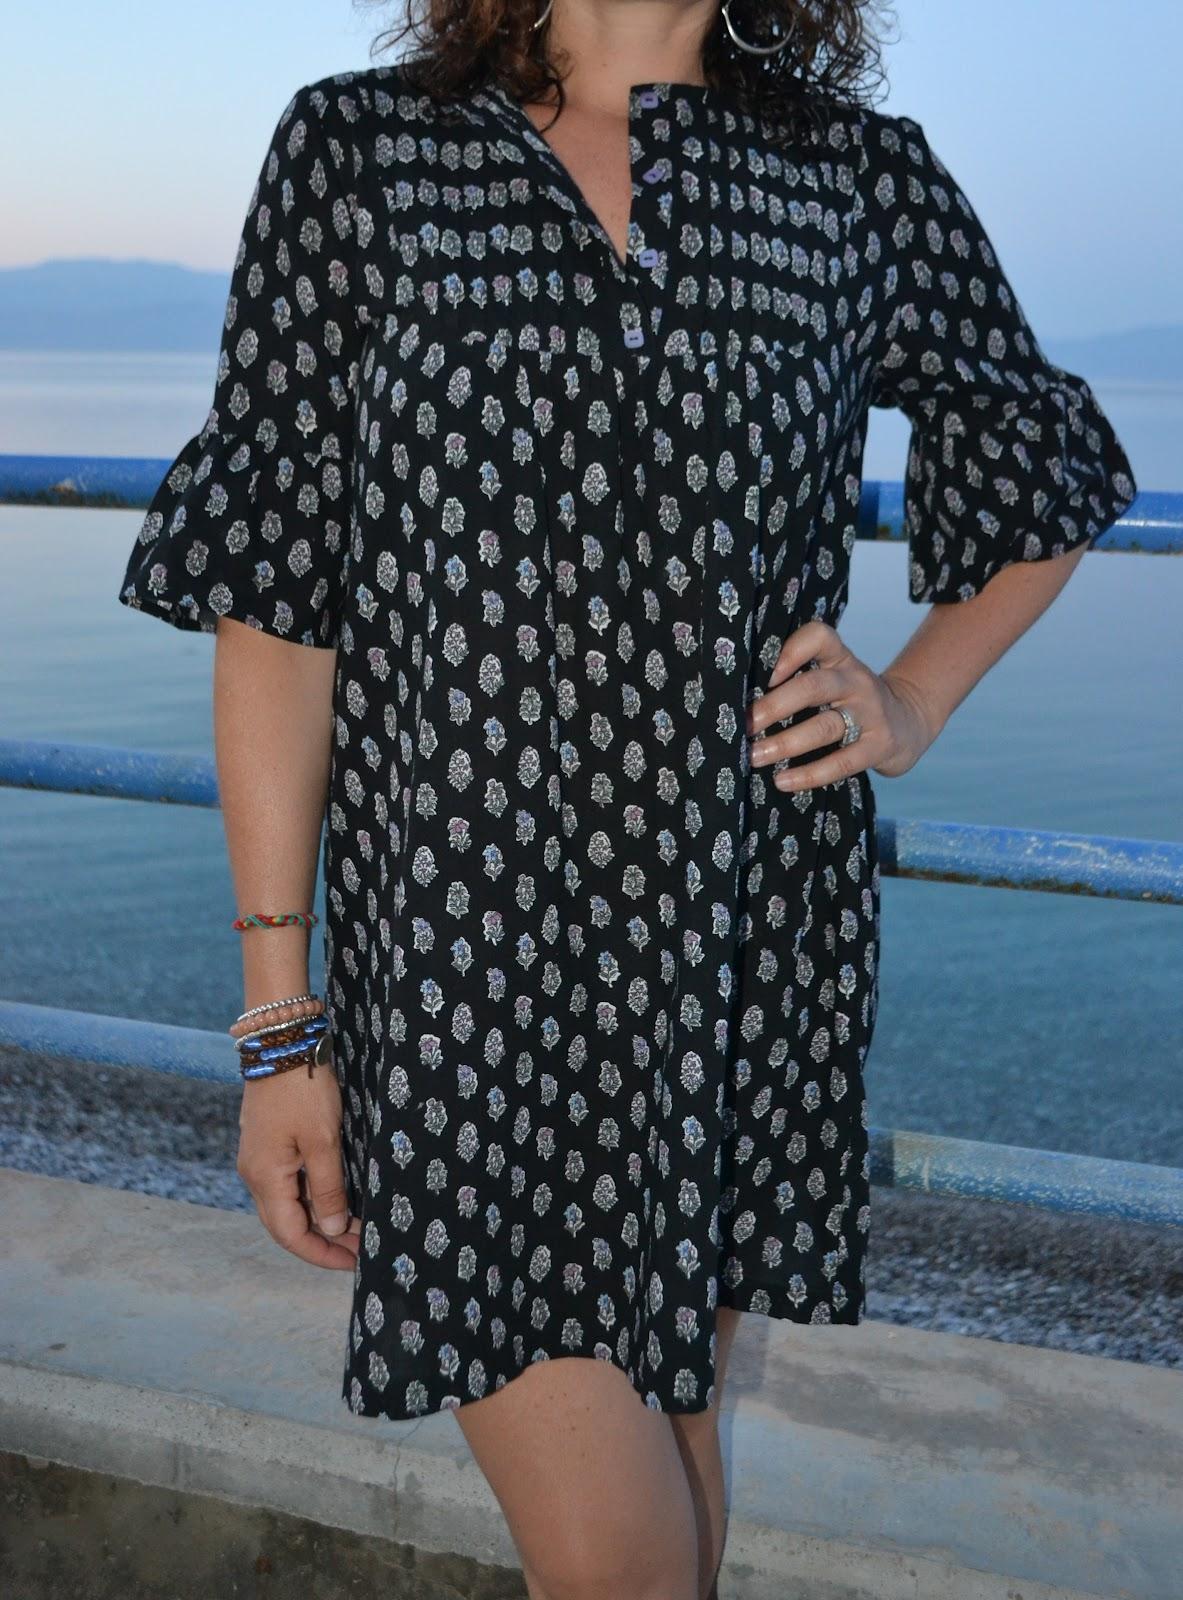 Sew Tessuti Blog - Sewing Tips U0026 Tutorials - New Fabrics Pattern Reviews Sneak Peak - Mia ...